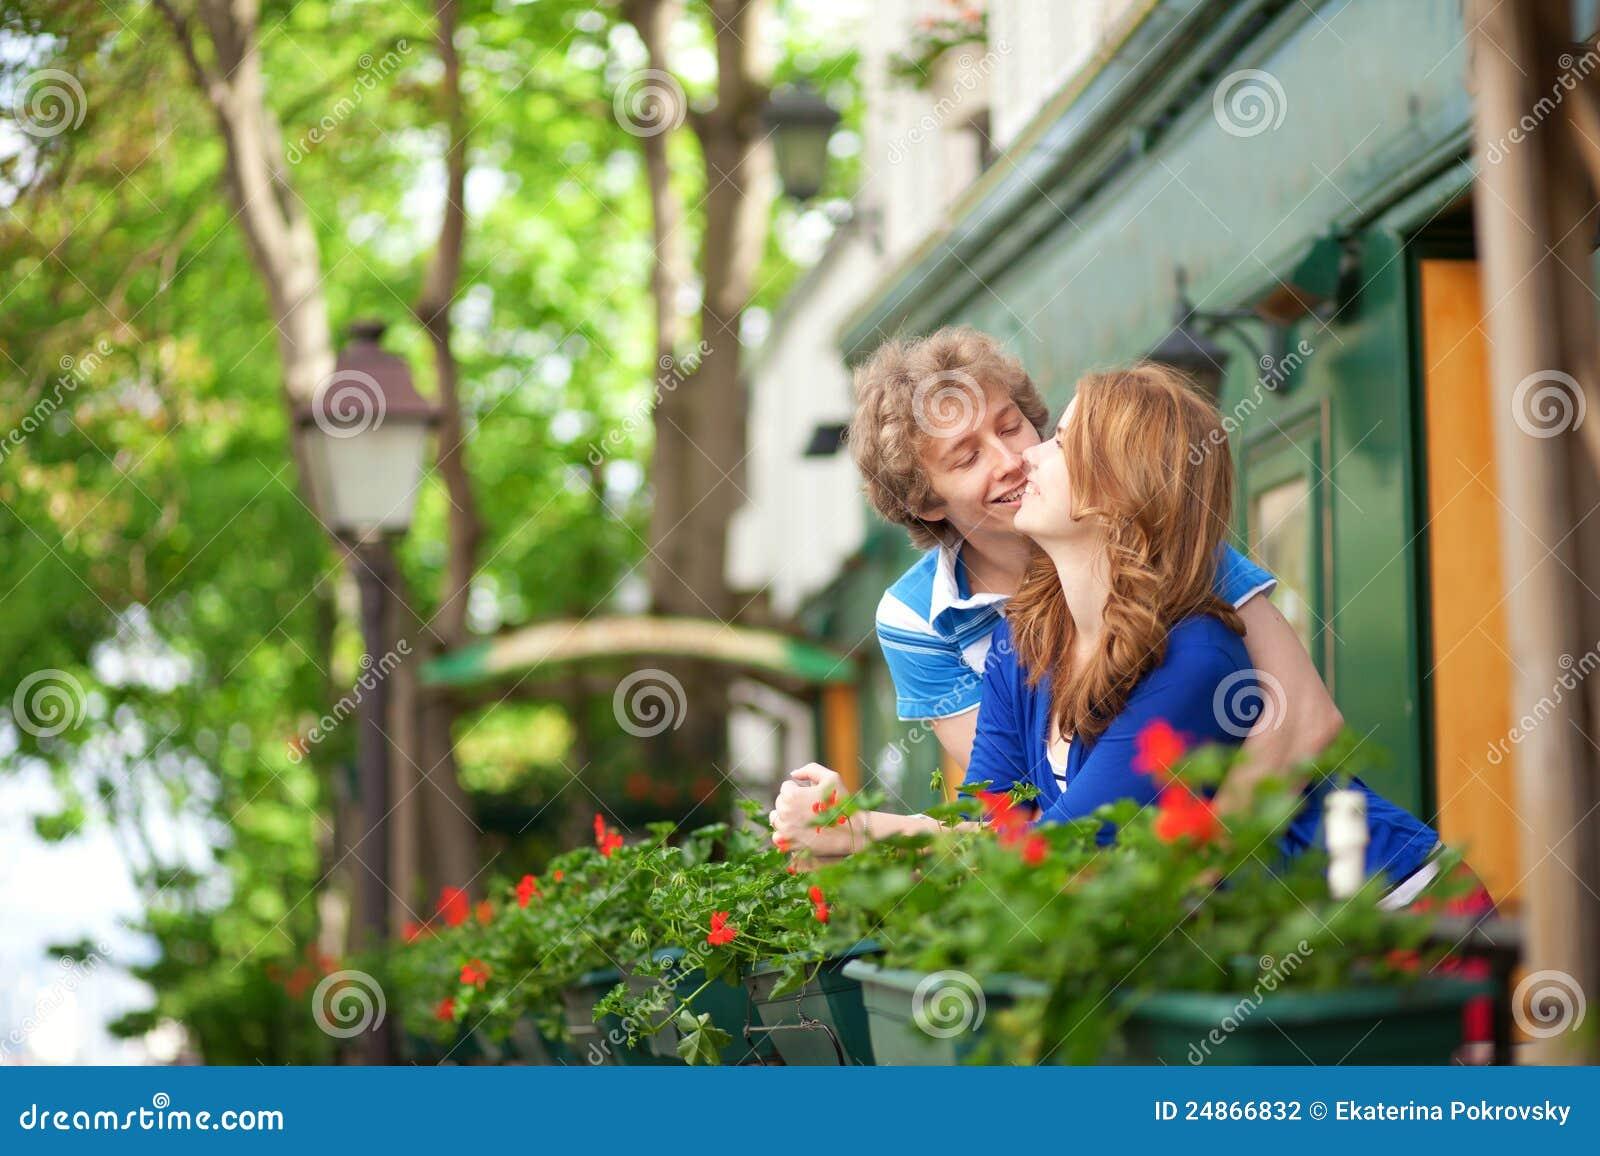 Romantic couple on the balcony stock photography - image: 24.